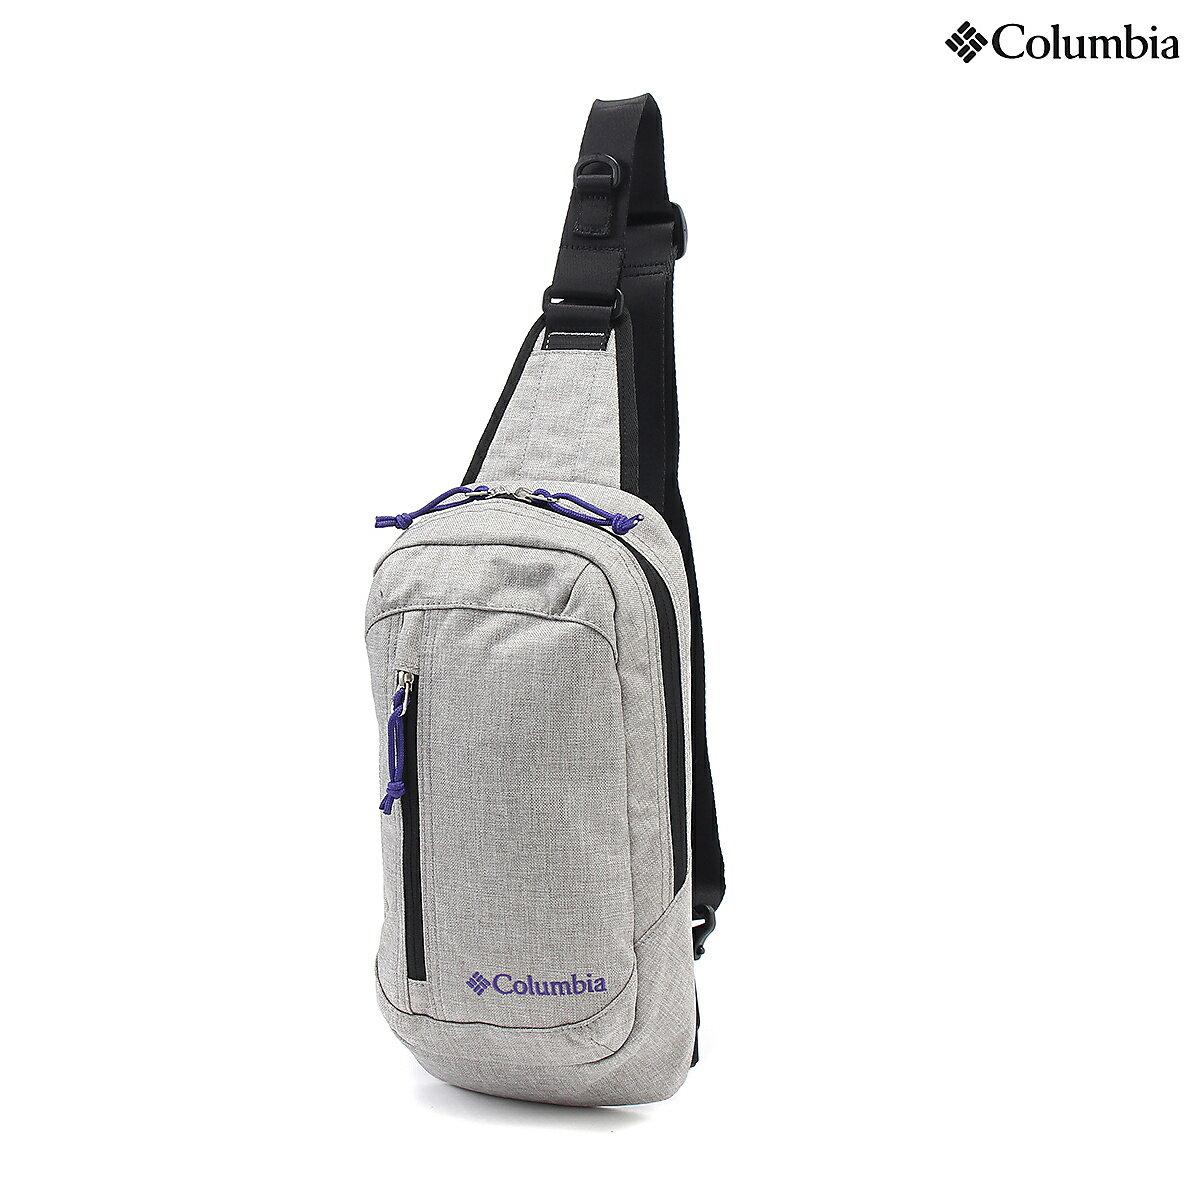 Columbia (コロンビア) トレッキング アウトドア ショルダーバック ヤムヒルフォークボディーバッグ O/S COLUMBIA GREY PU8156-039